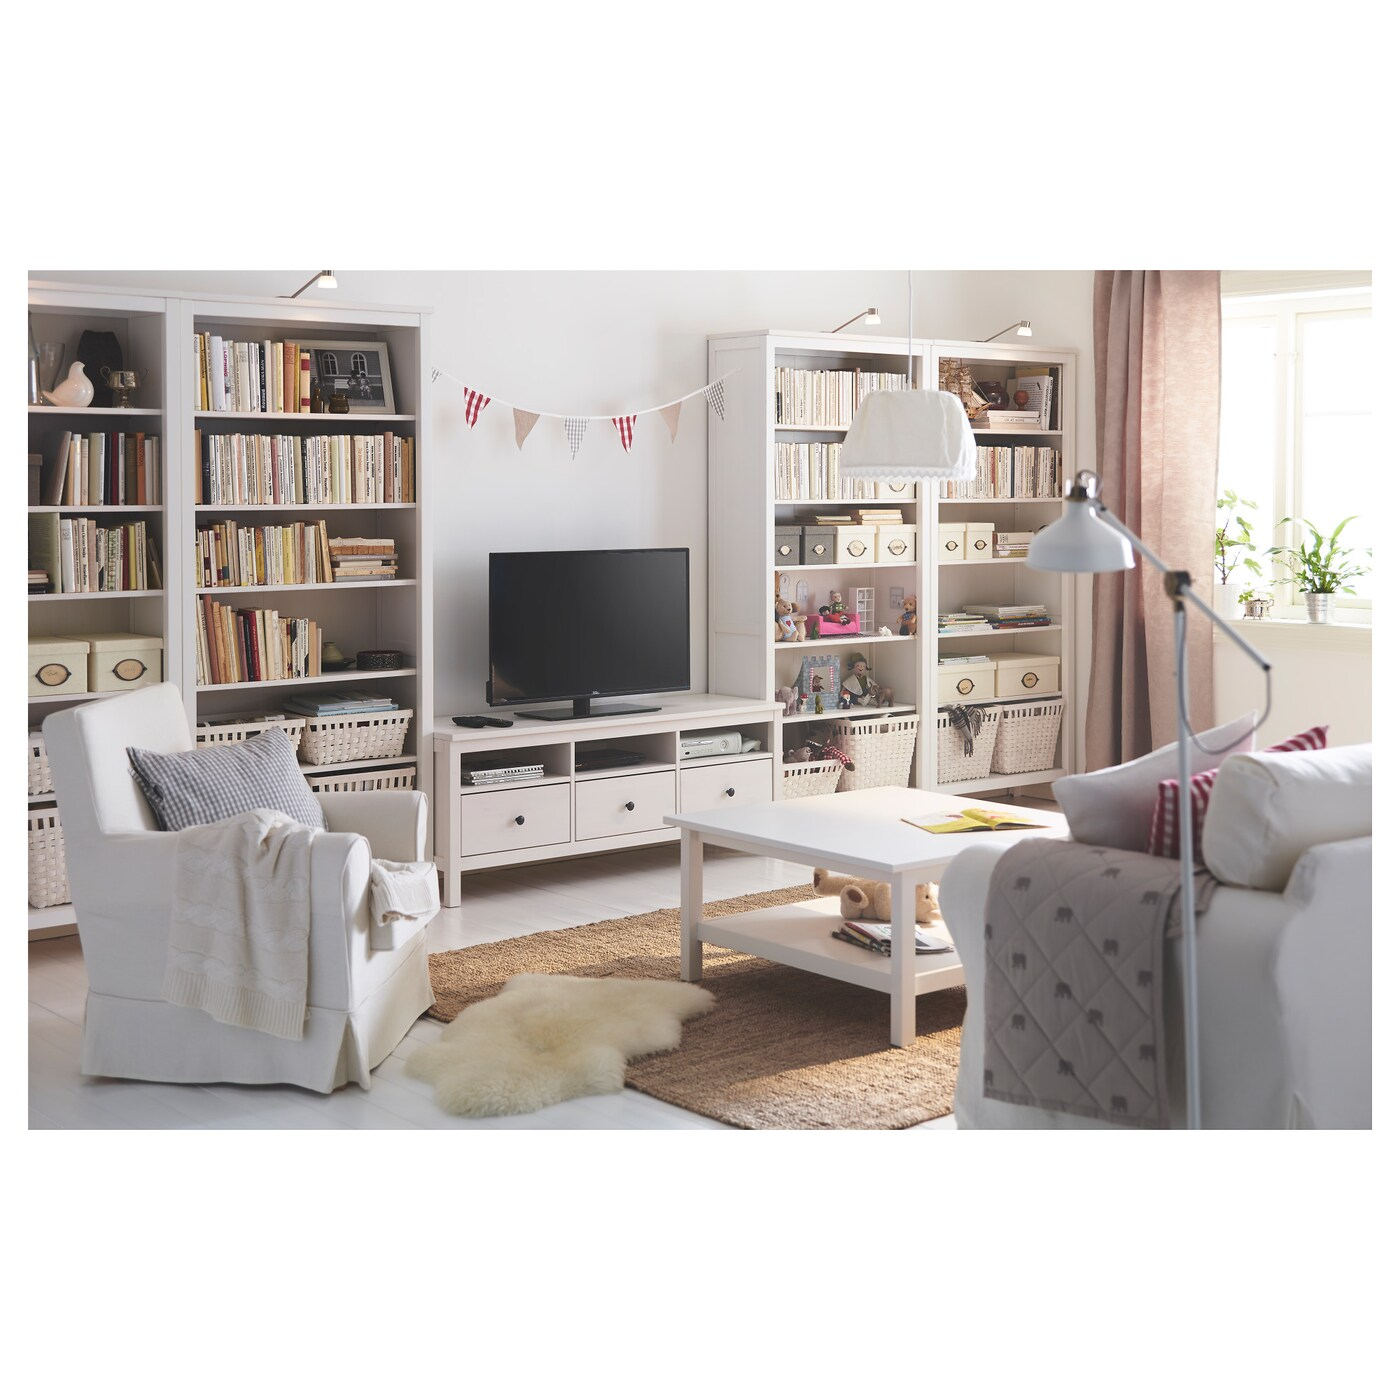 Hemnes mueble tv tinte blanco 148 x 47 x 57 cm ikea - Mueble television ikea ...